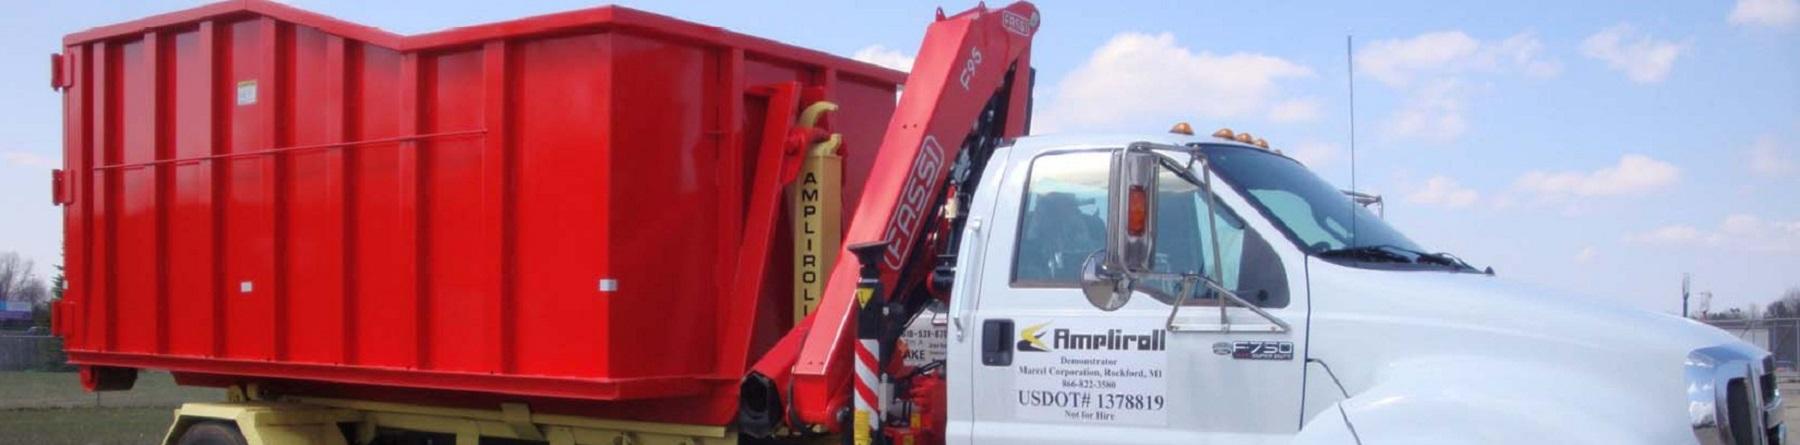 Dump Bed Semi Truck Banner